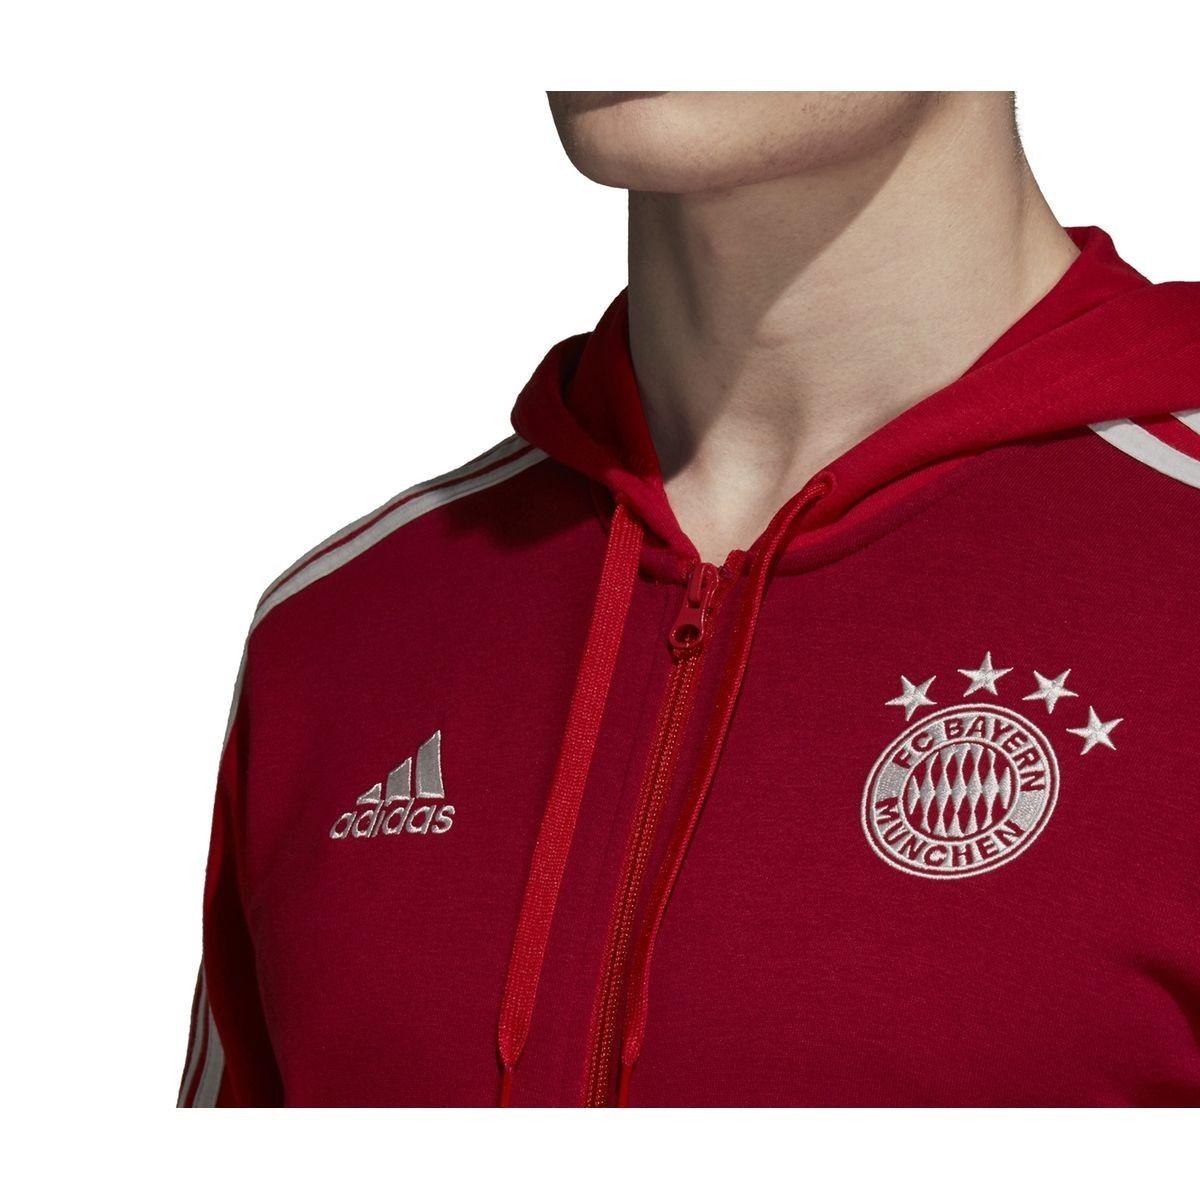 Veste à capuche Bayern Munich 3 stripes   Adidas, Veste a